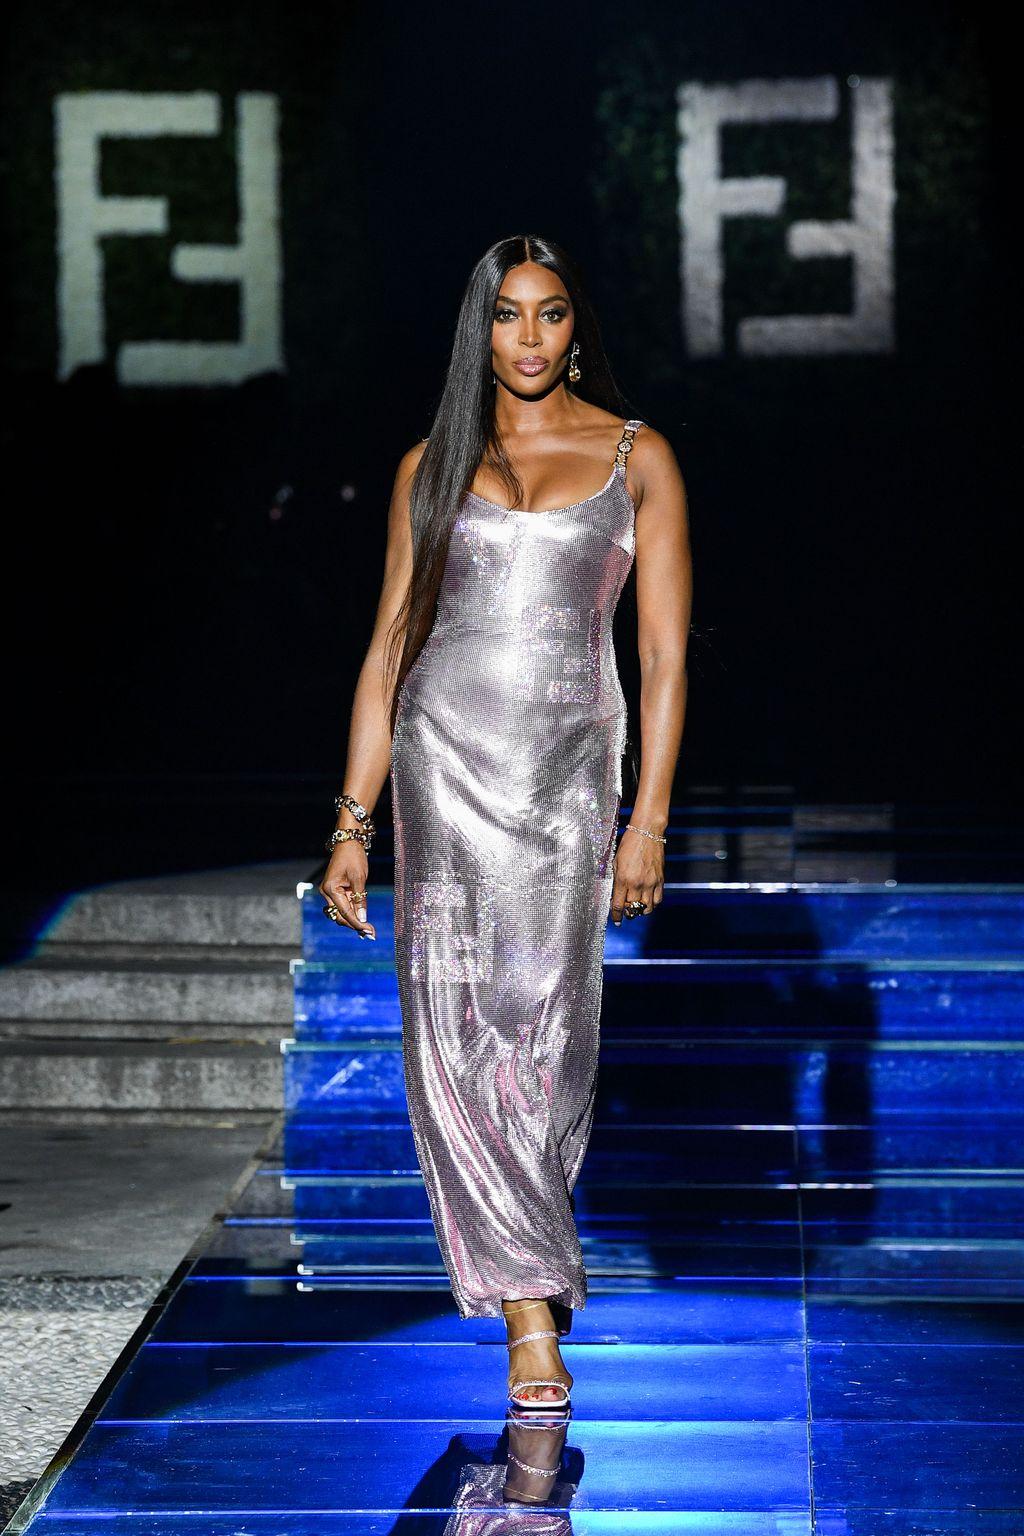 Koleksi Fendace - Fendi by Versace